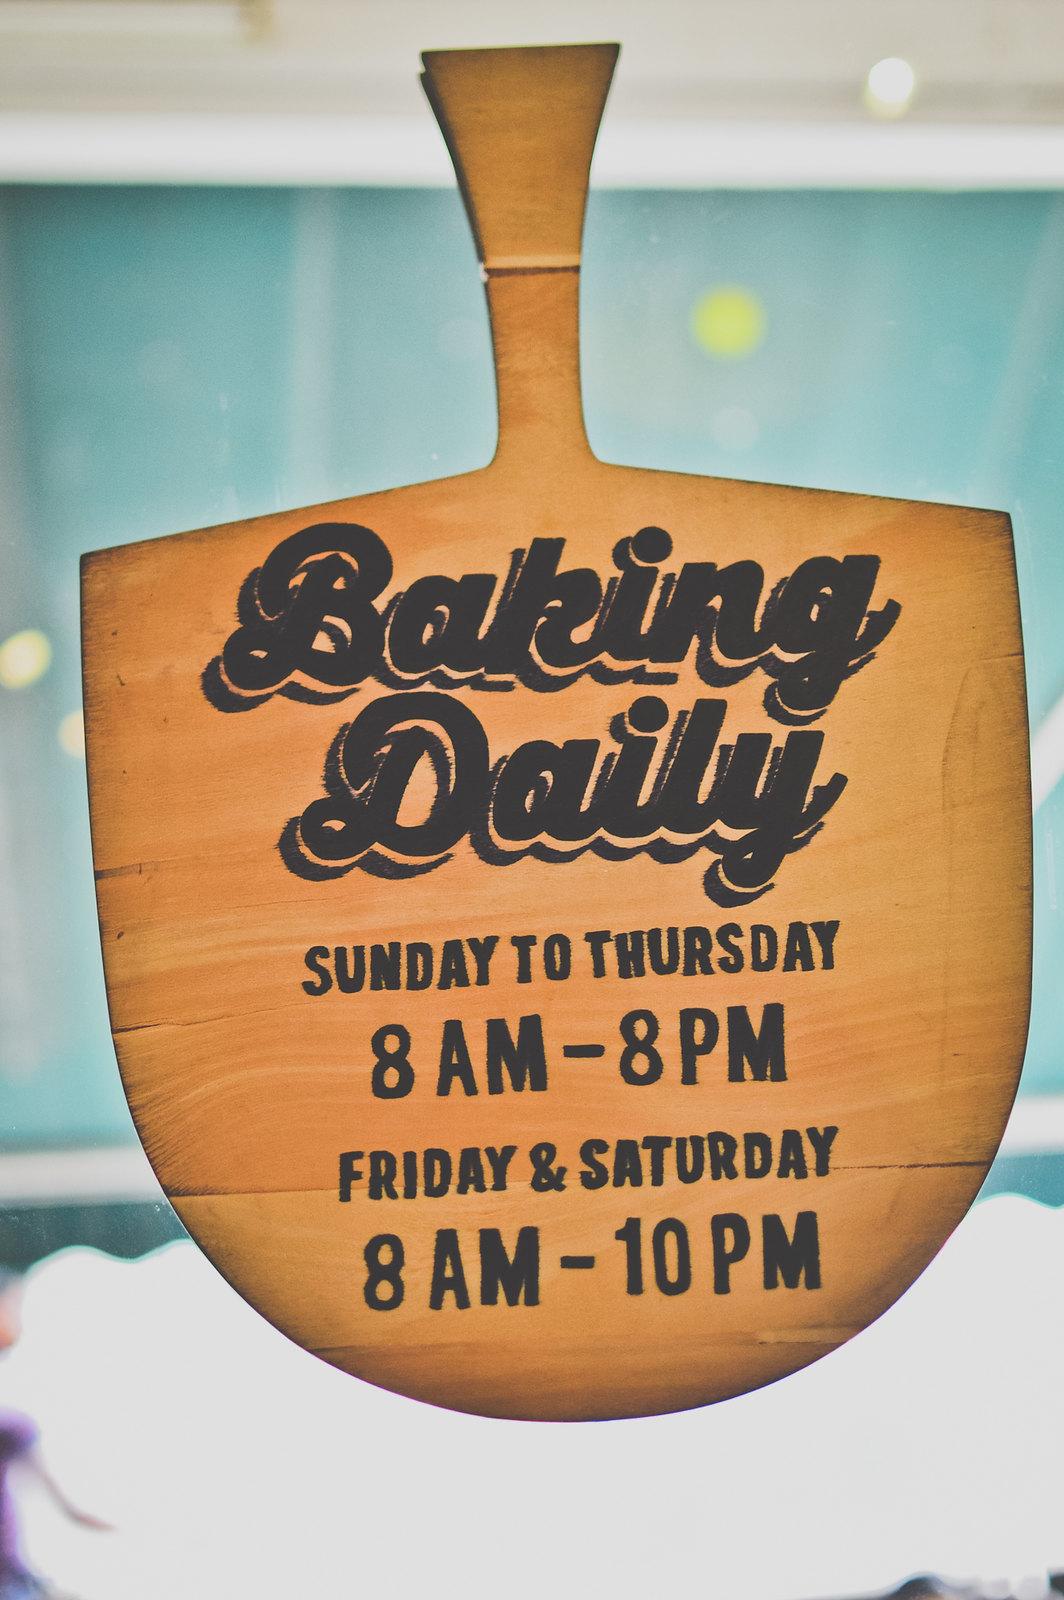 Tiong Bahru Bakery